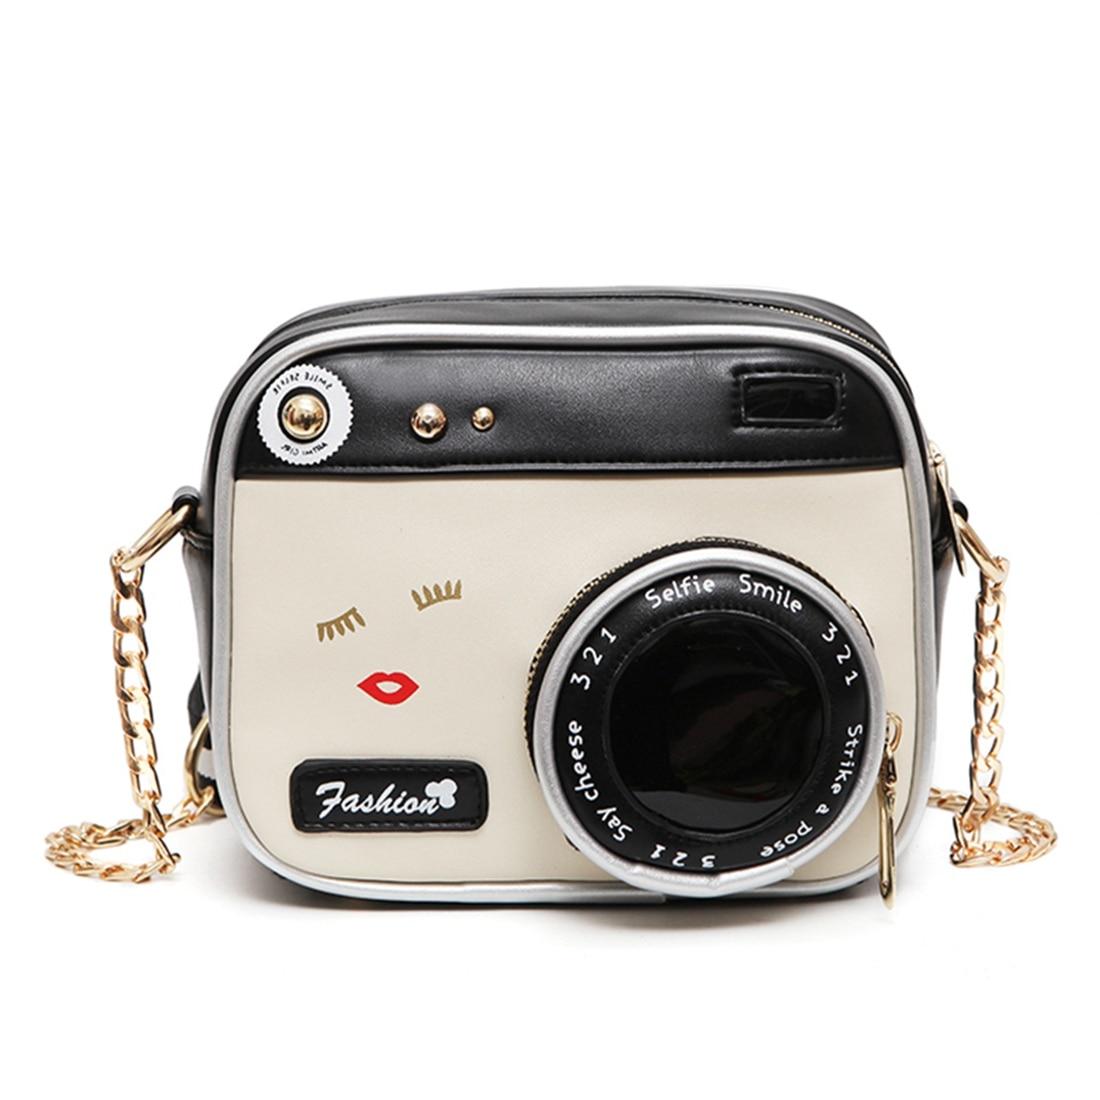 New Female Tide Shoulder Bag Retro Bag Fashion Camera Shoulder Bag Small Party Handbag Chain Messenger Bag